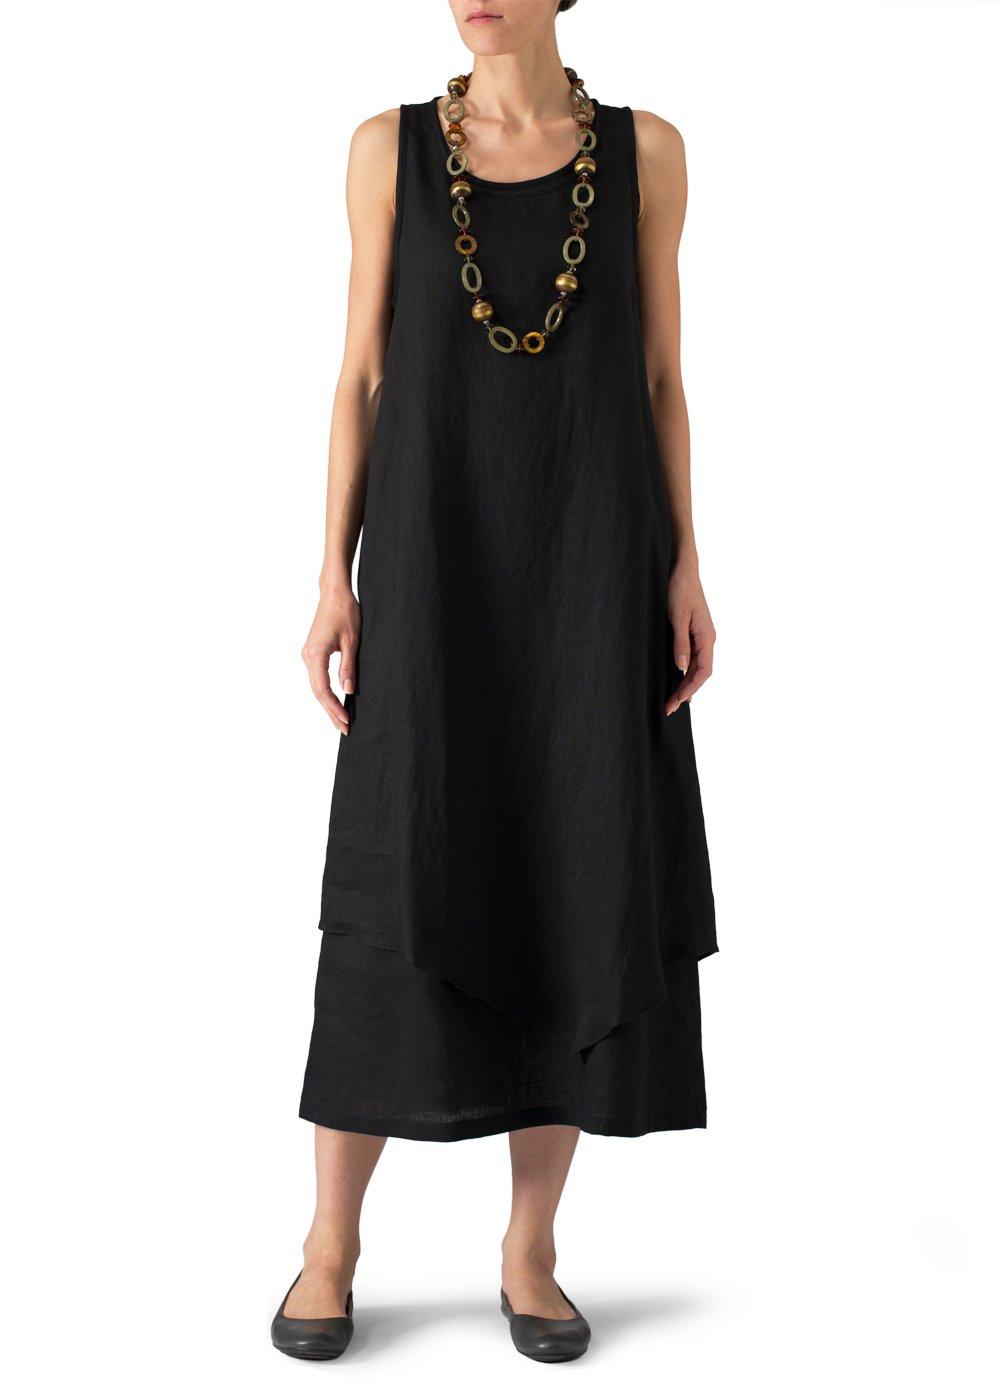 Vivid Linen Double Layered Long Dress-S-Black/Black